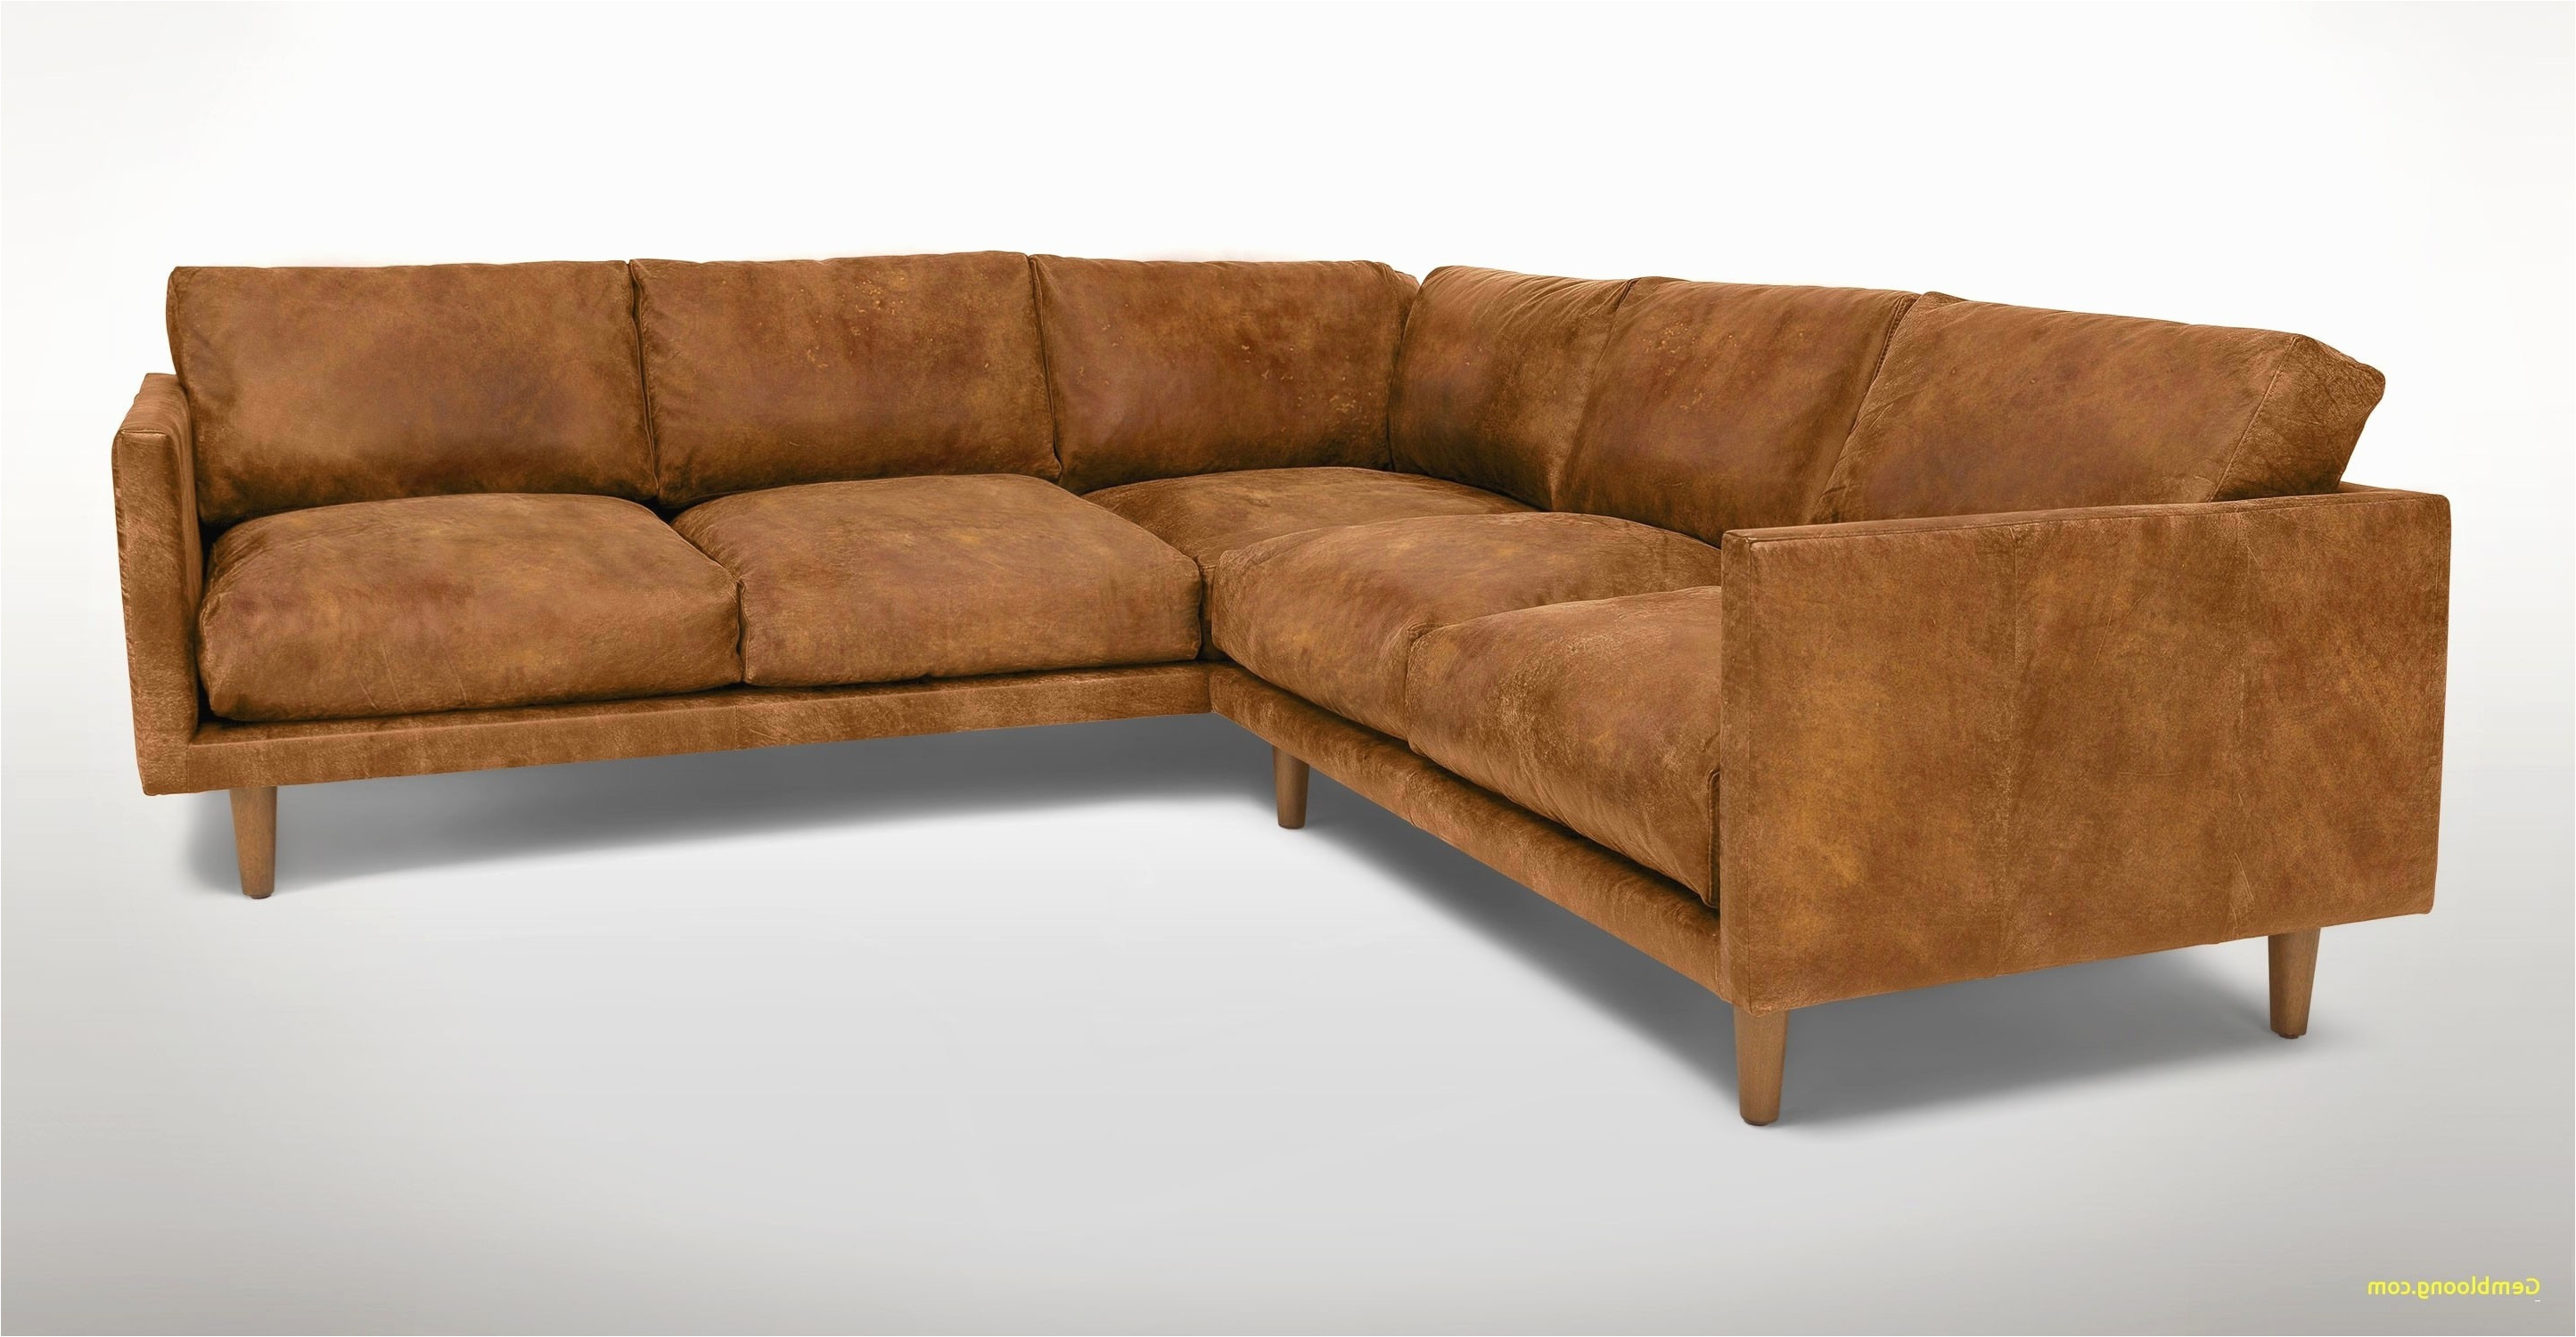 bainbridge double fabric chaise local bainbridge sectional sofa fresh amazing modular sectional sofa